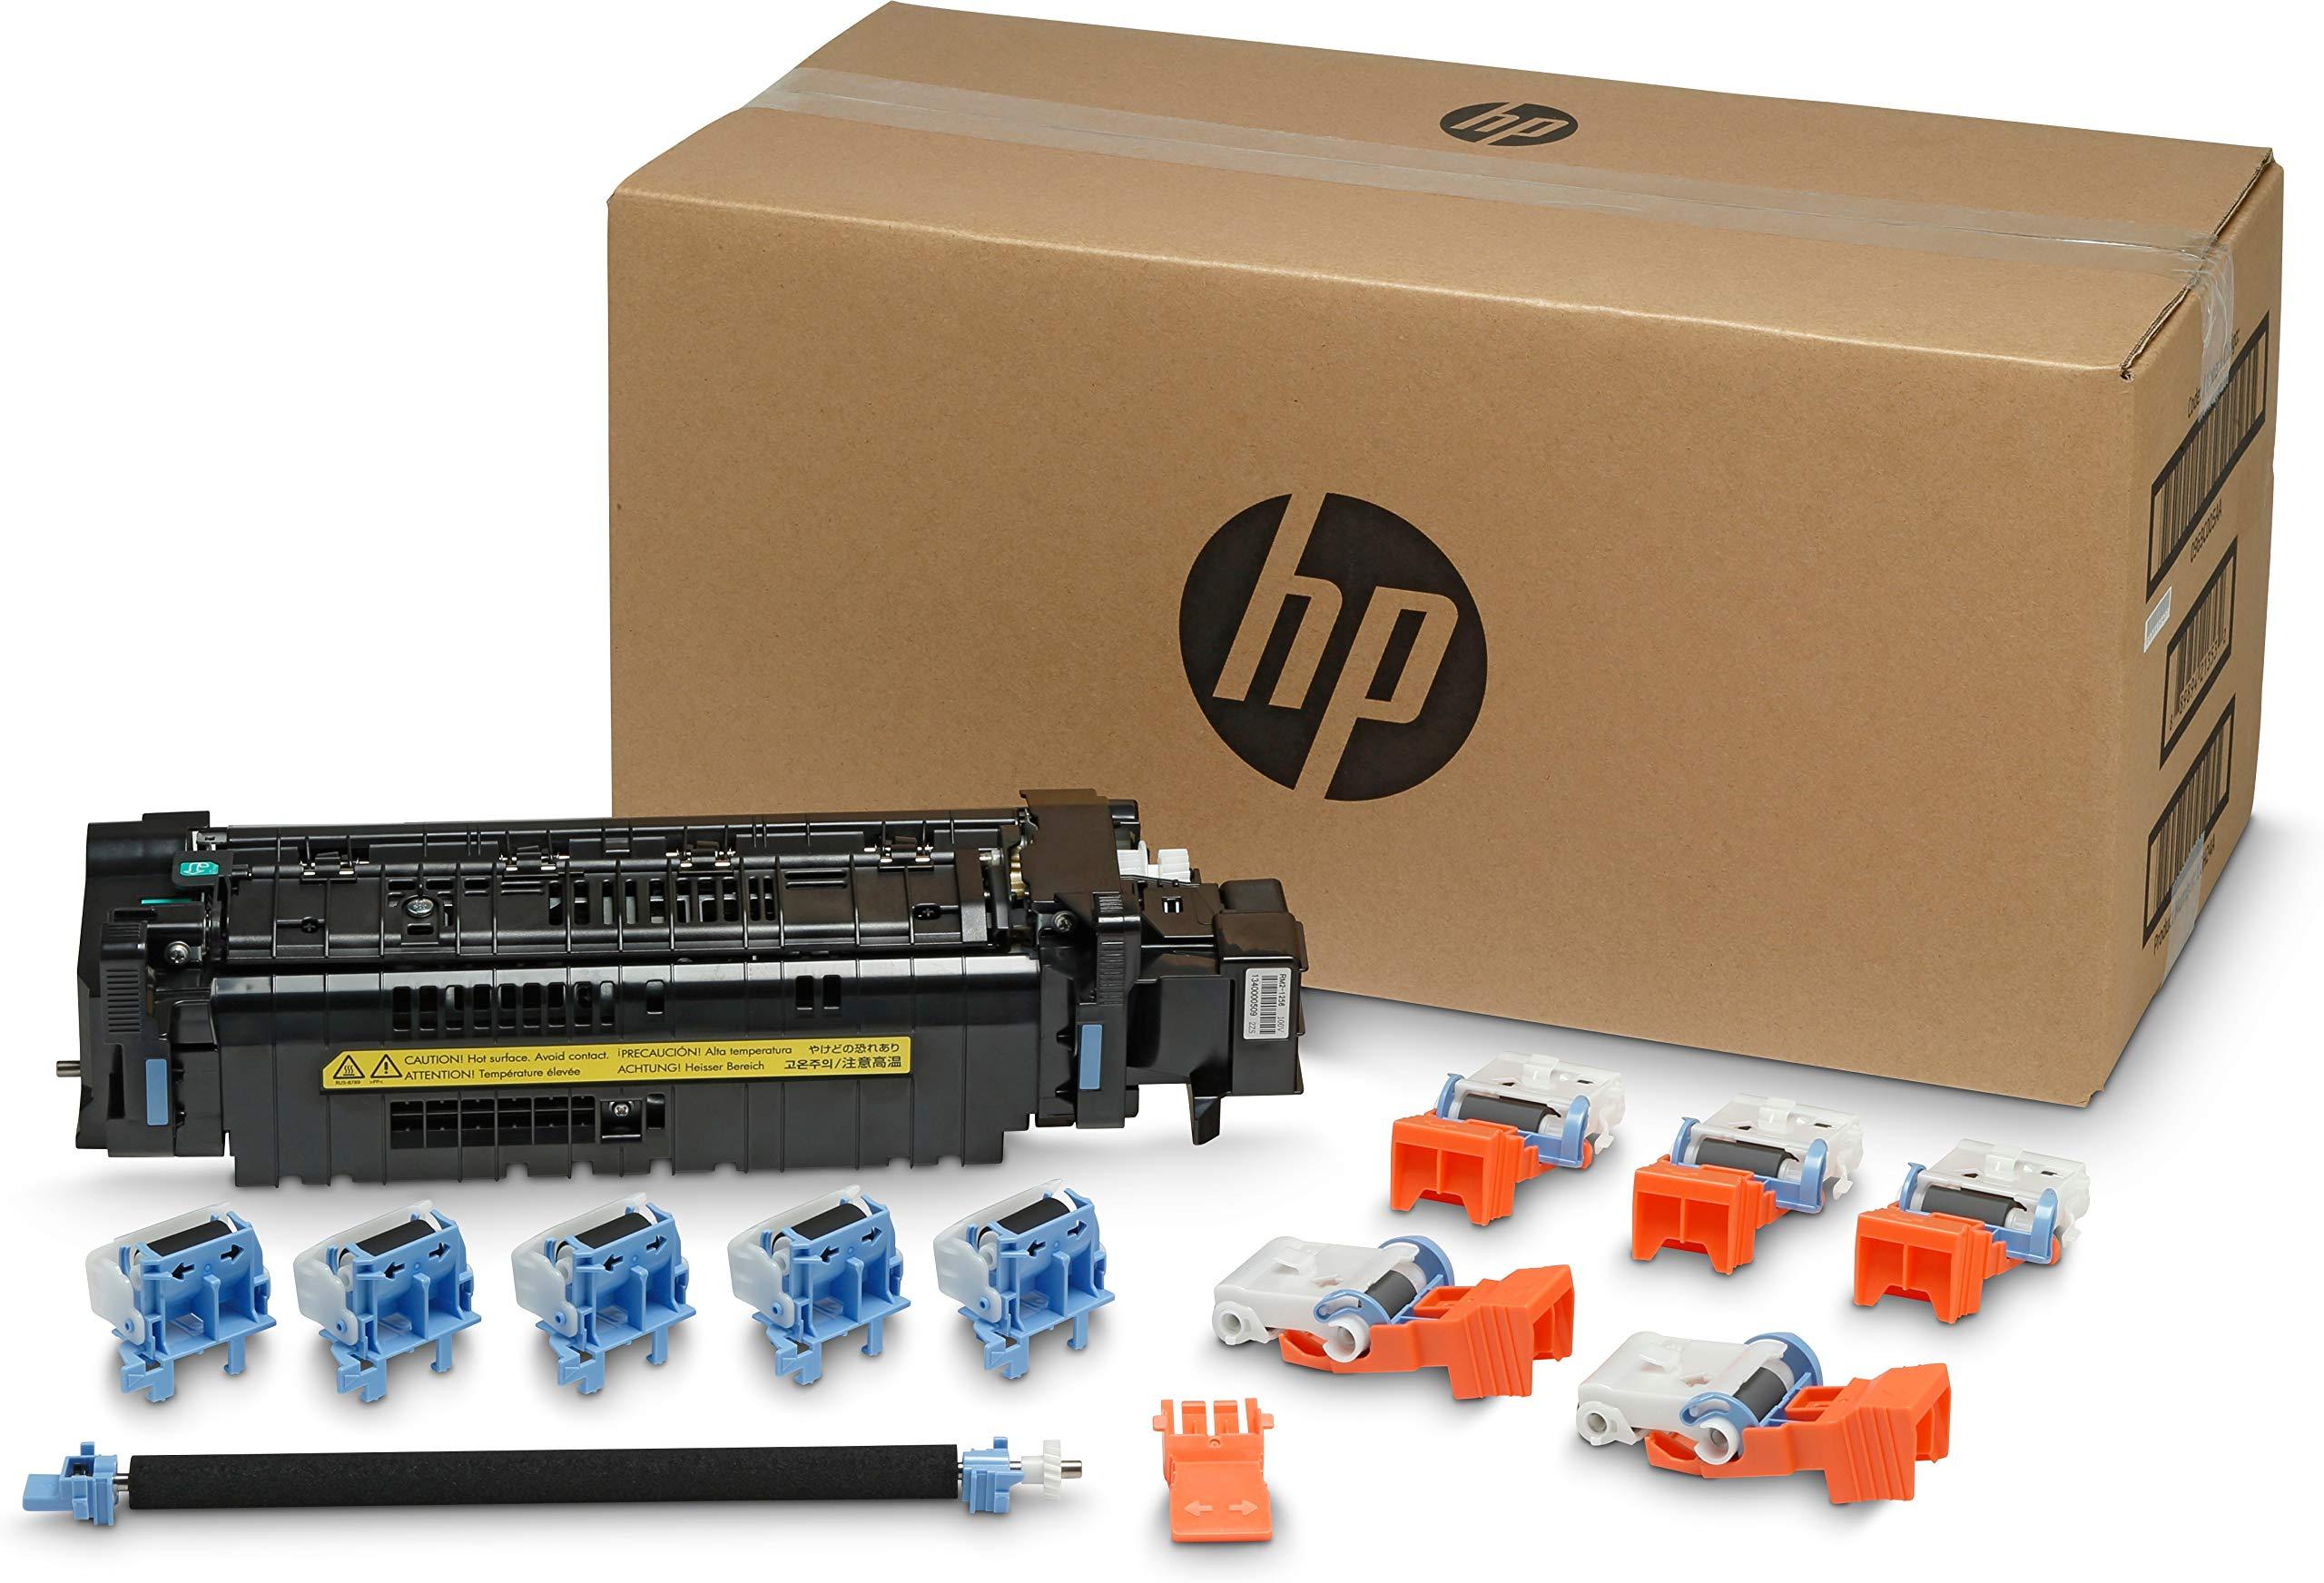 HP P1B91A Original Maintenance Kit for M652, M653 Printers by HP